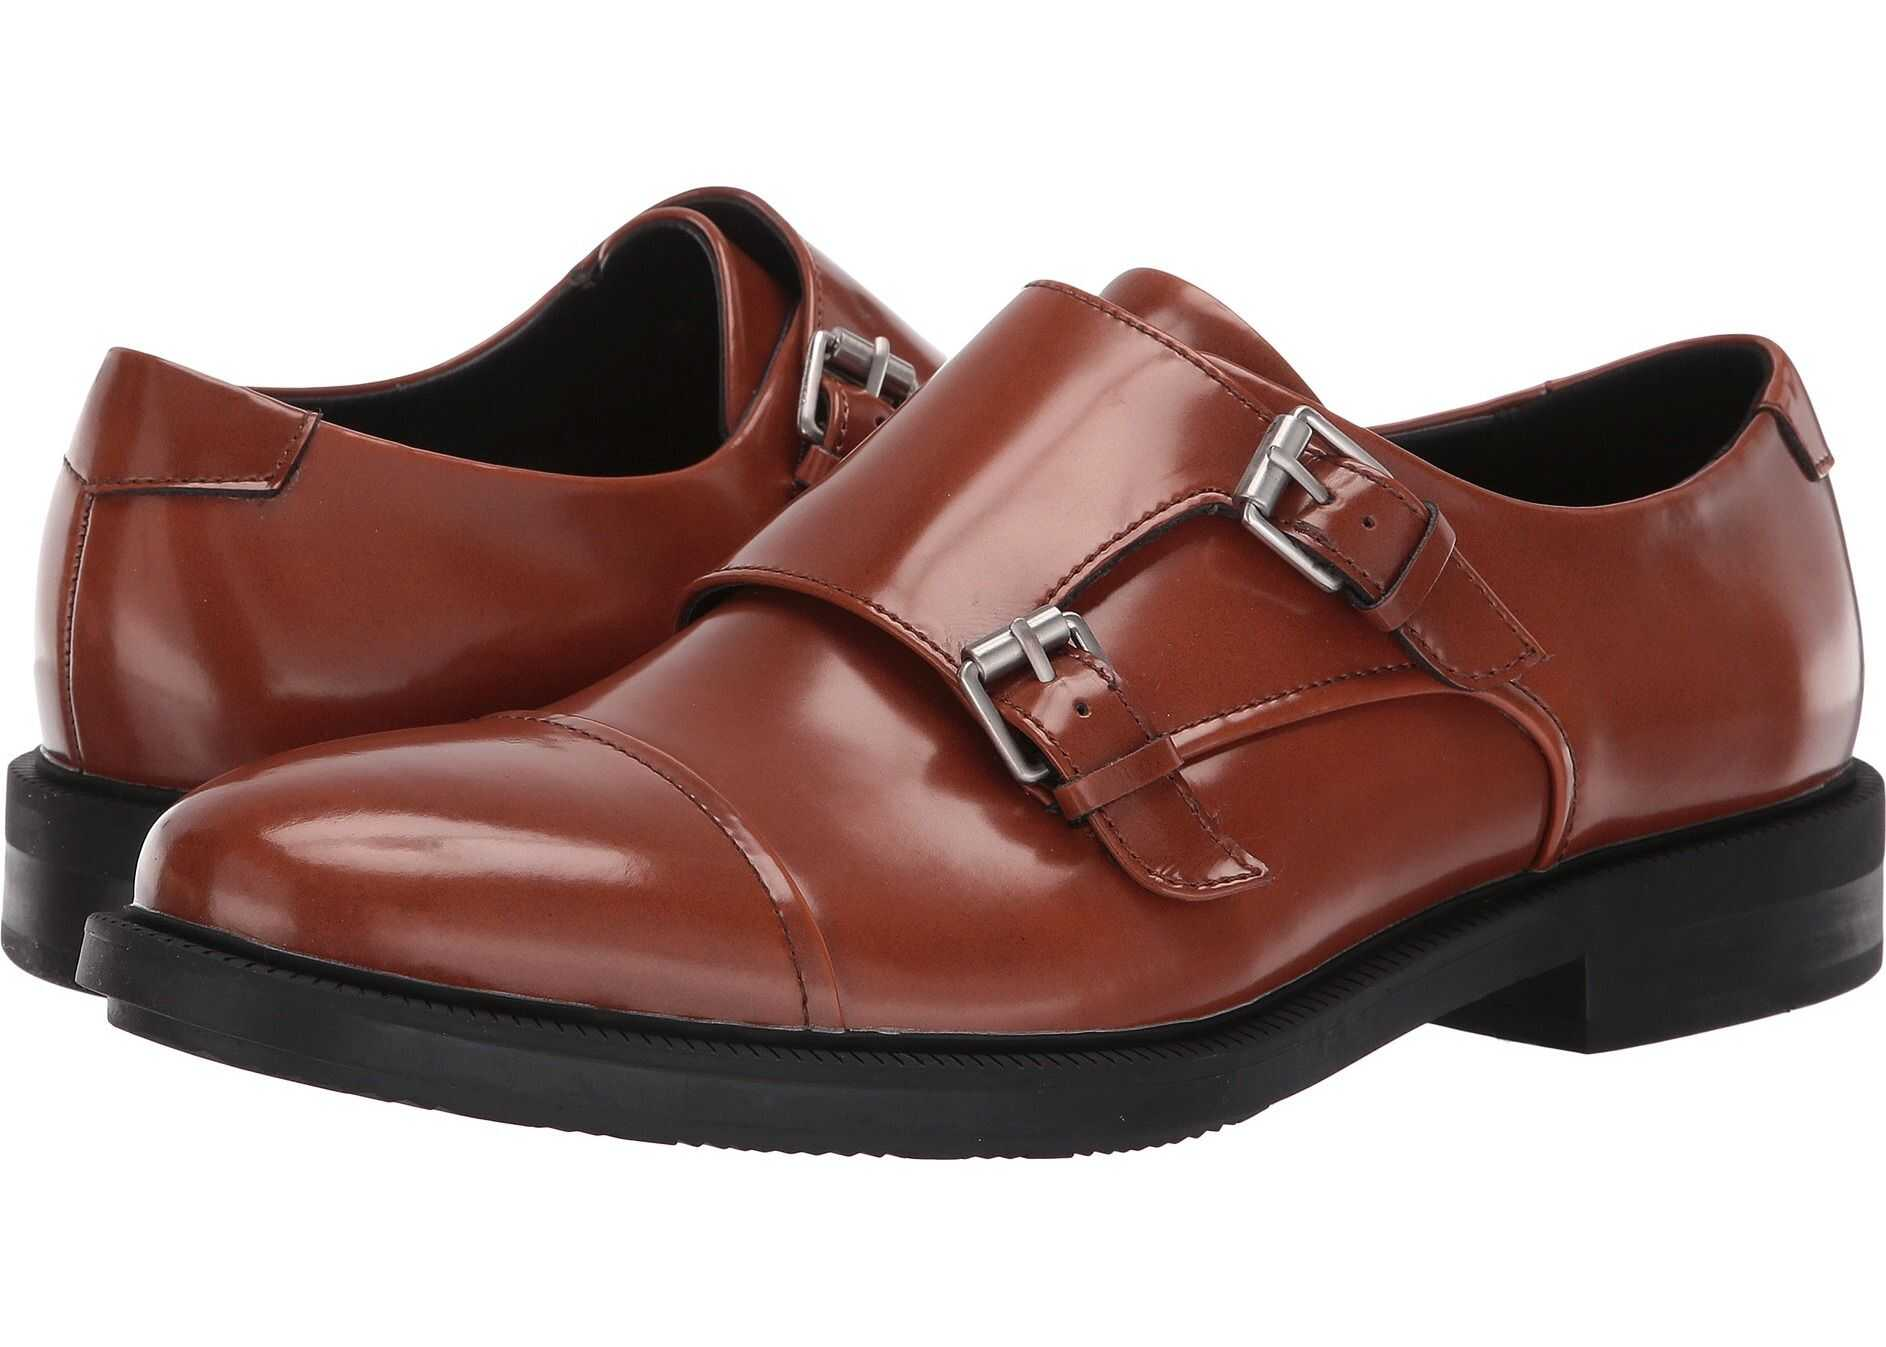 Calvin Klein Candon Vachetta Brush-Off Box Leather